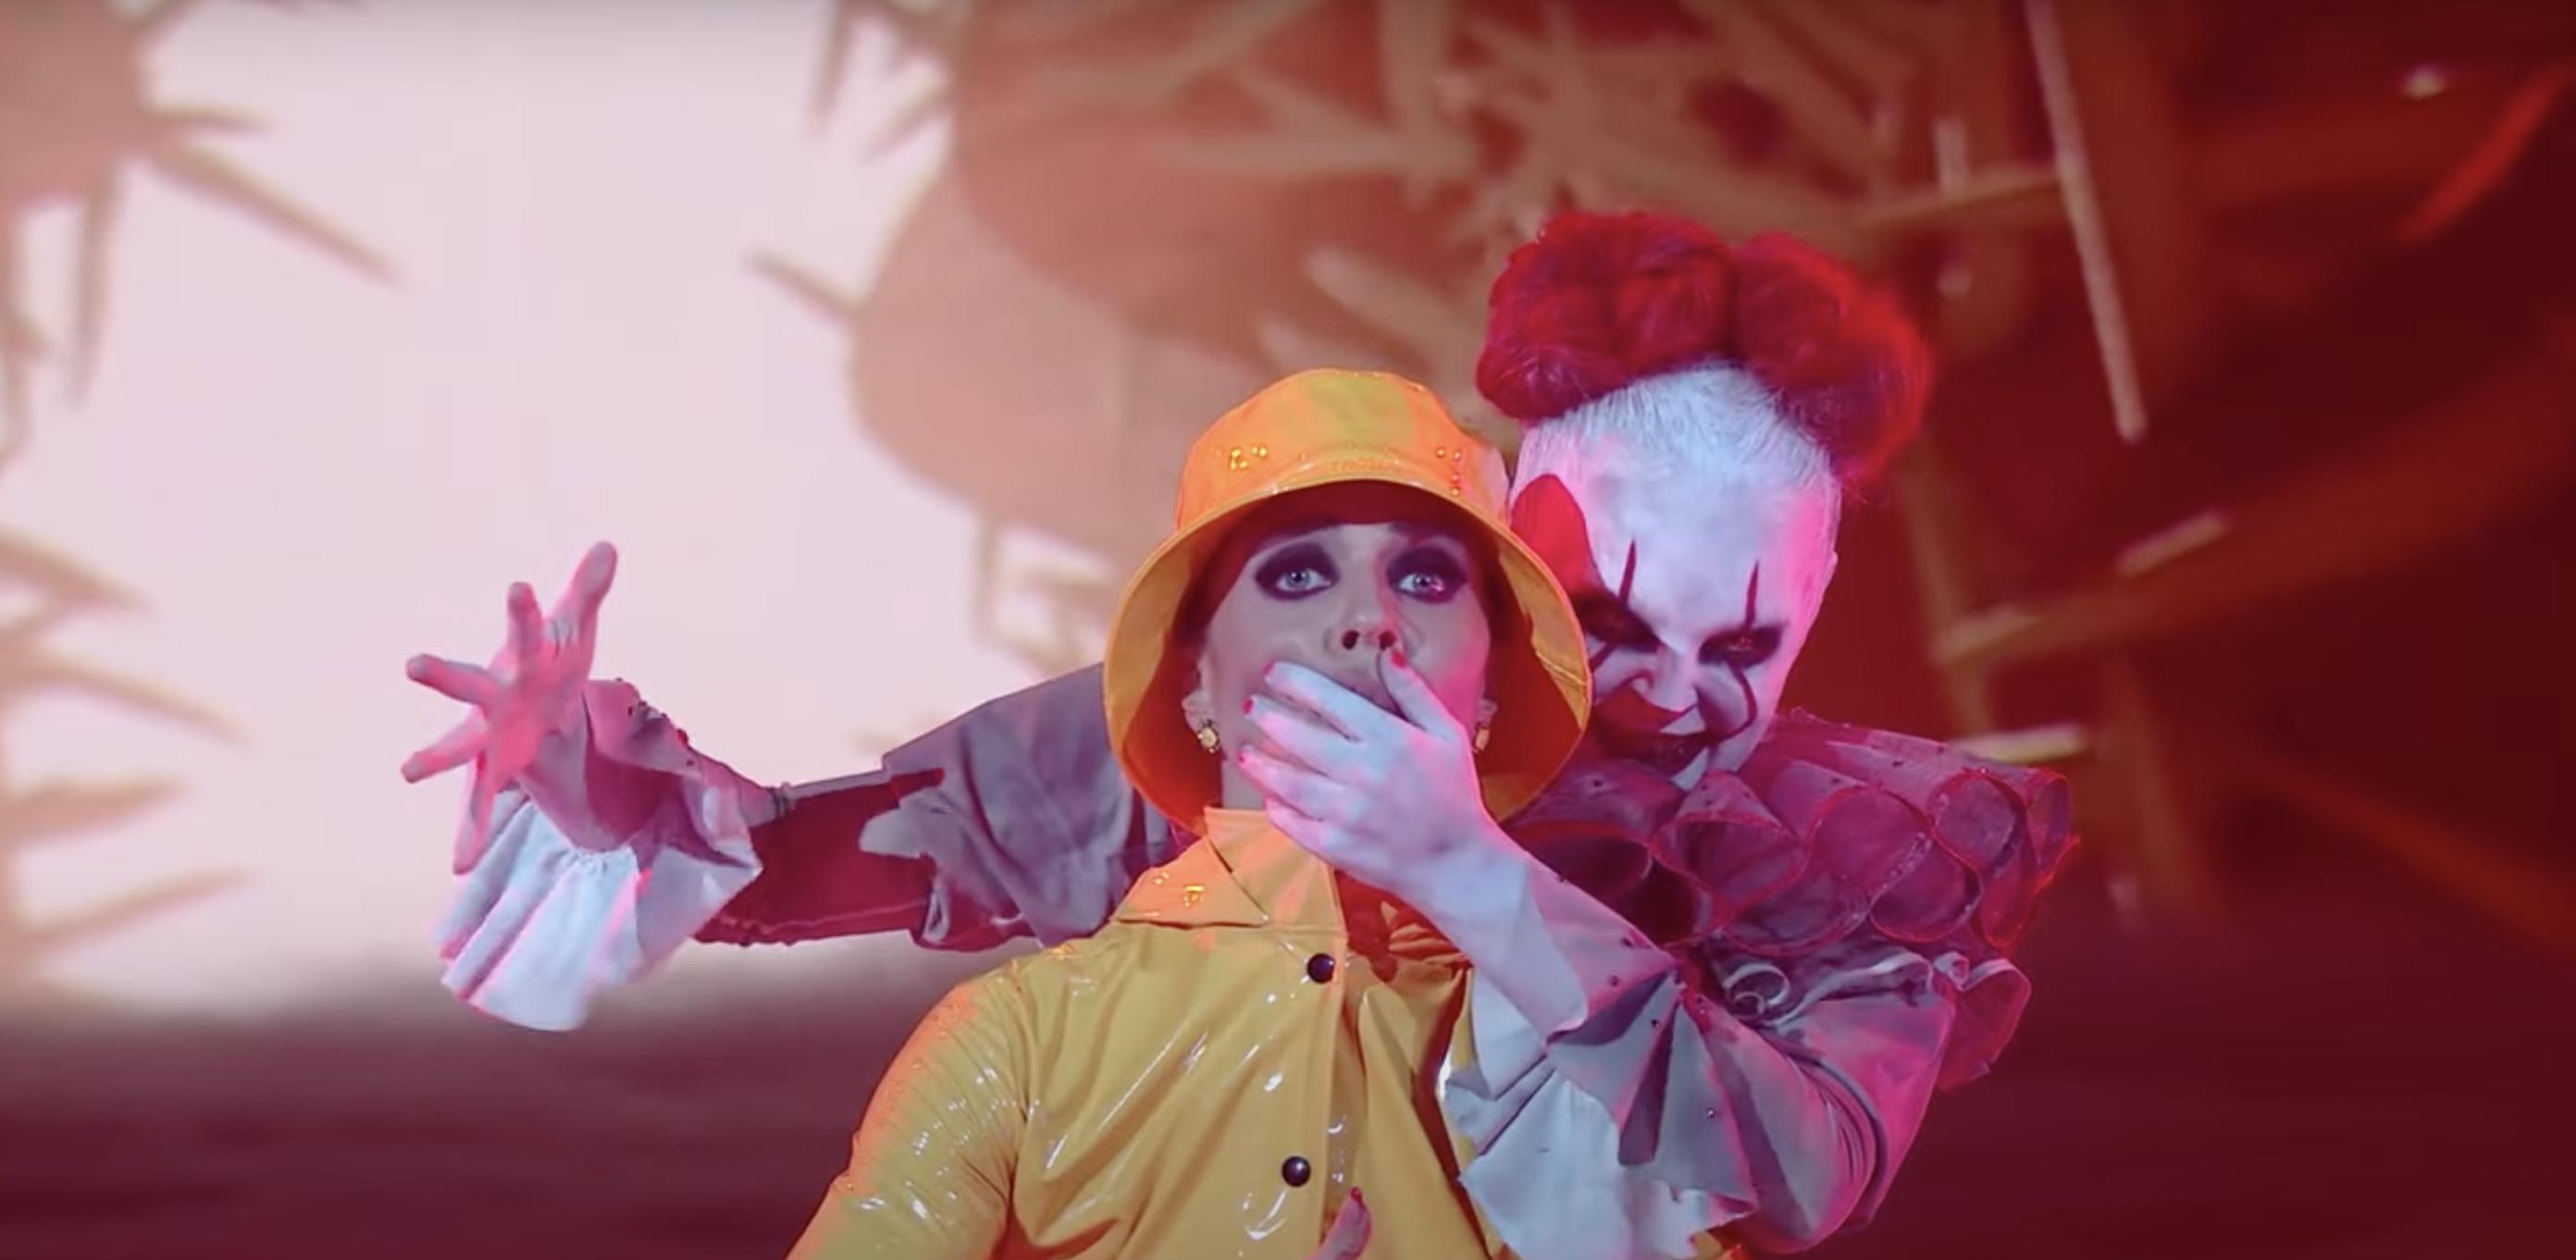 jojo siwa, but dressed as a spooky clown, sneaking up on Jenna Johnson who wears a yellow raincoat